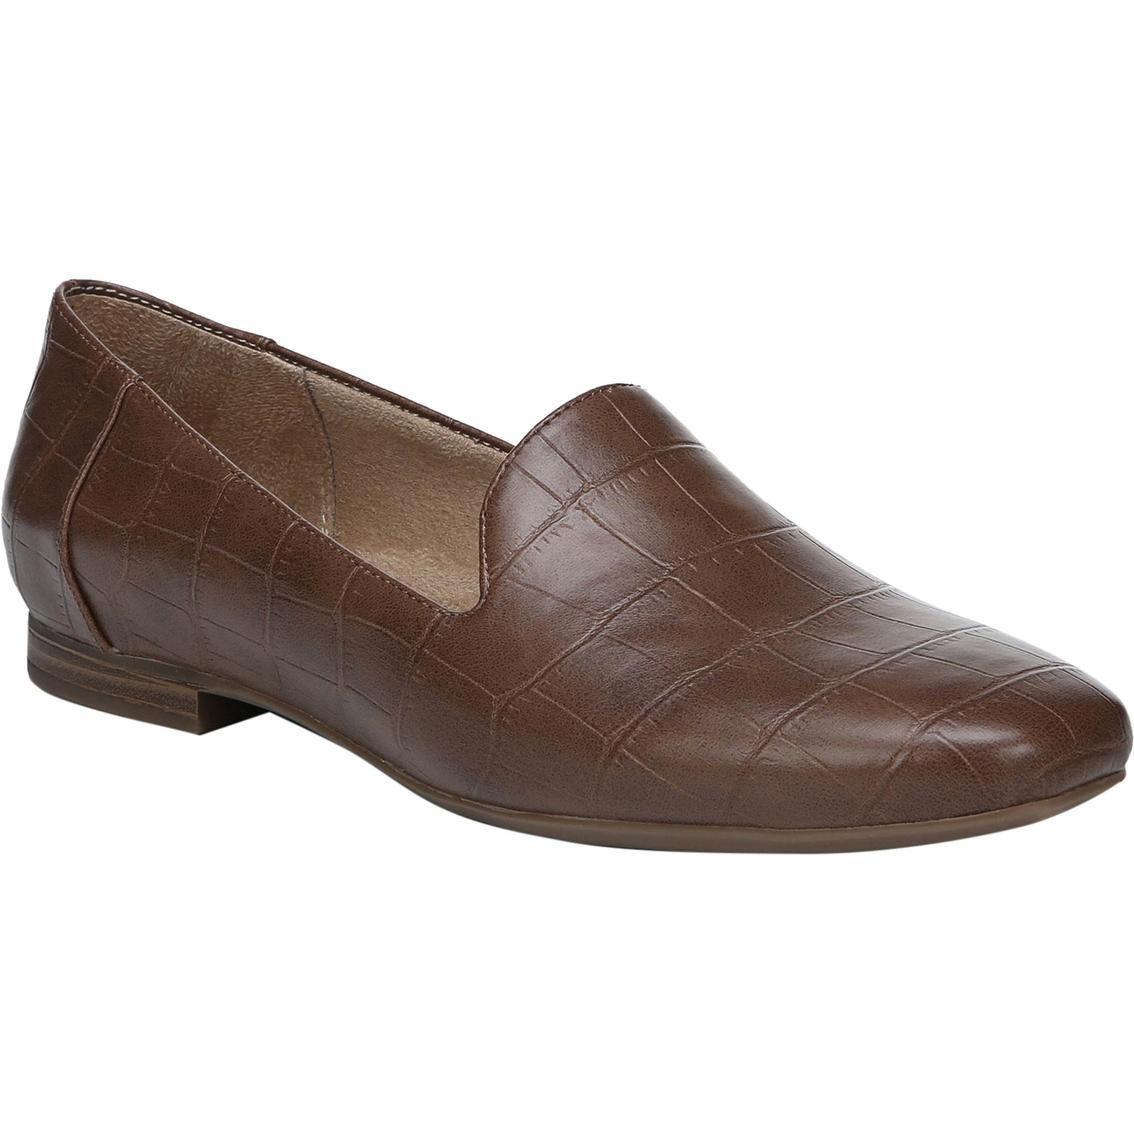 de3d70f6fee Naturalizer Women s Kit 2 Flat Loafers